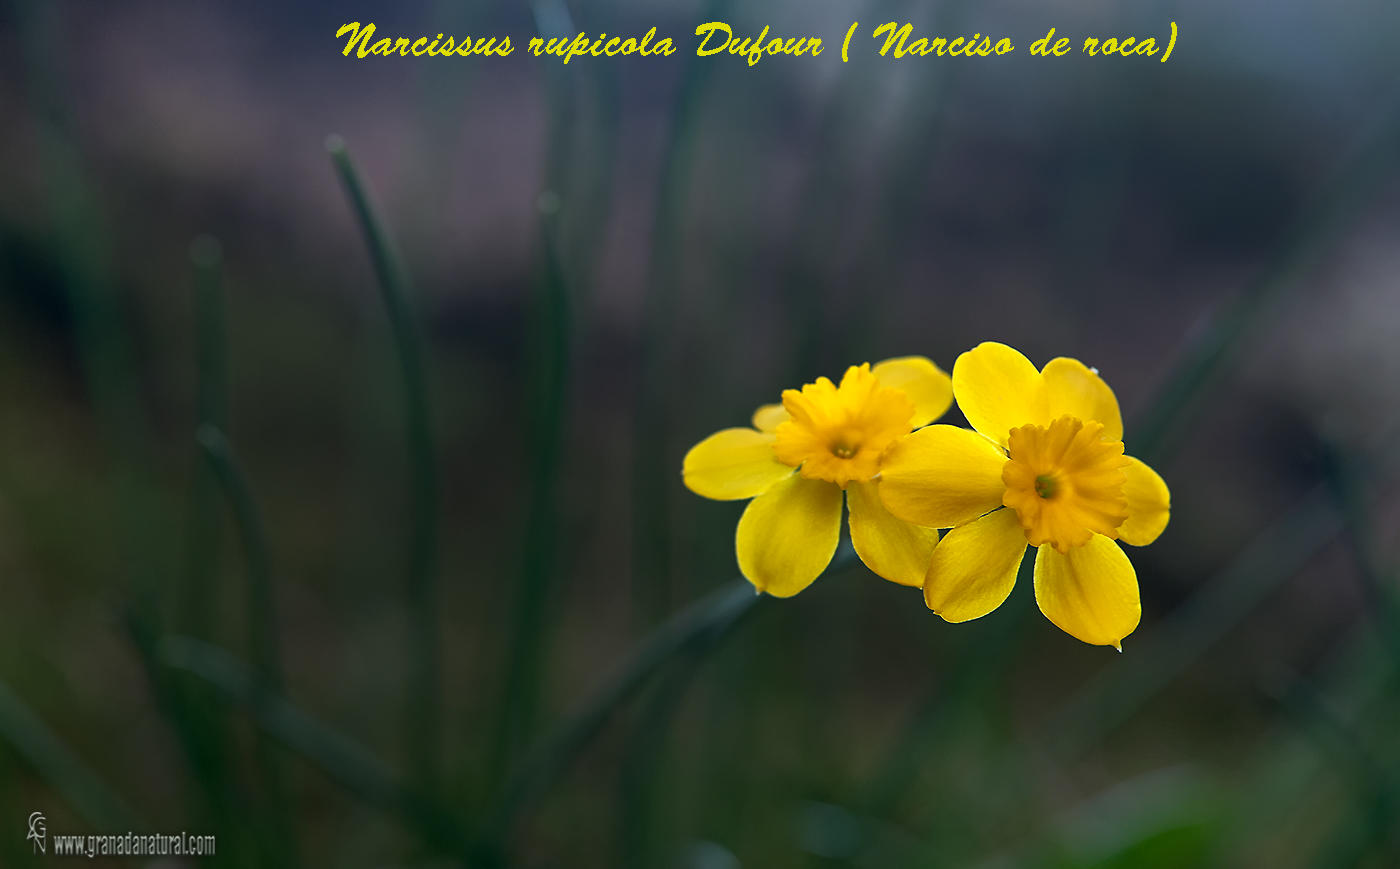 Narcissus rupicola ( Narciso de roca) (Lucas Gutierrez Jiménez)